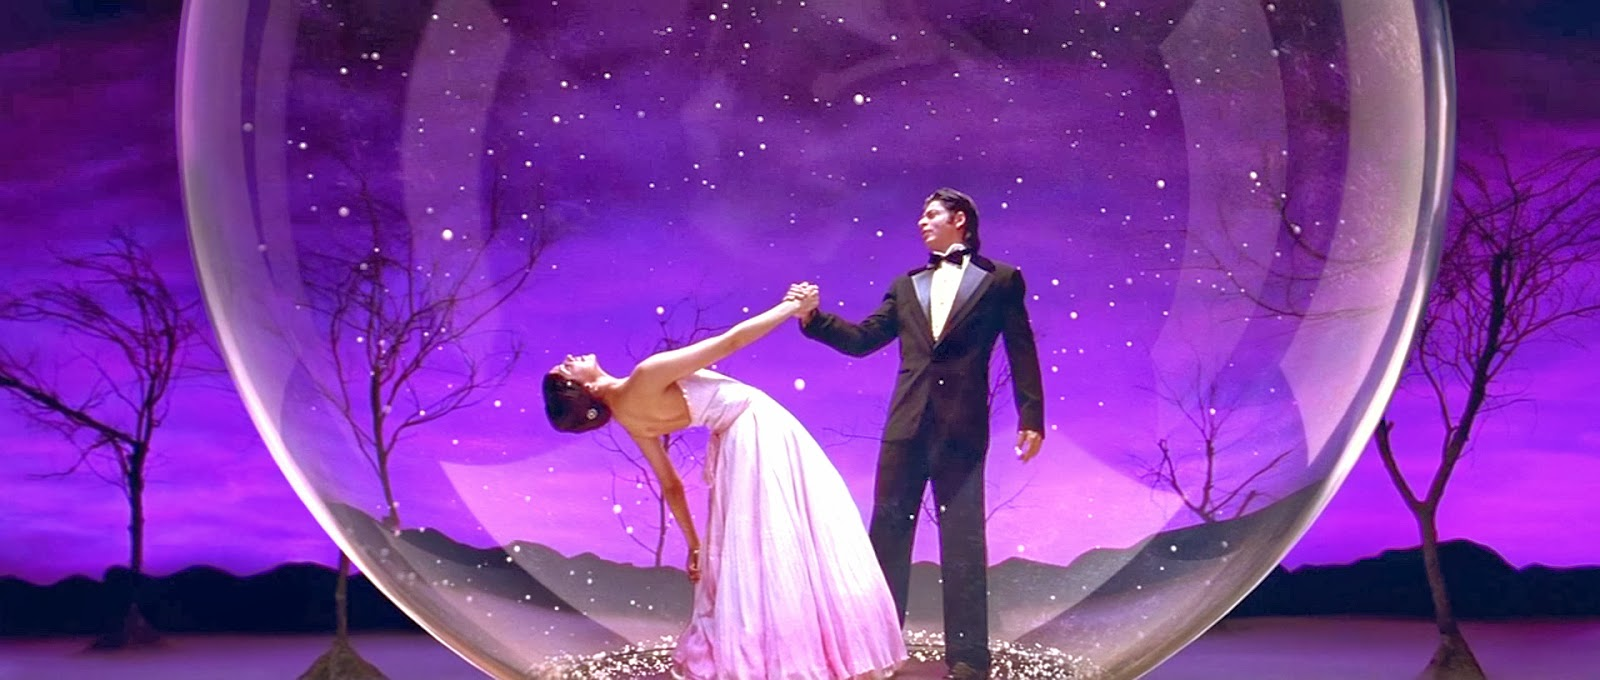 dhoom 2 full movie download khatrimaza 480p